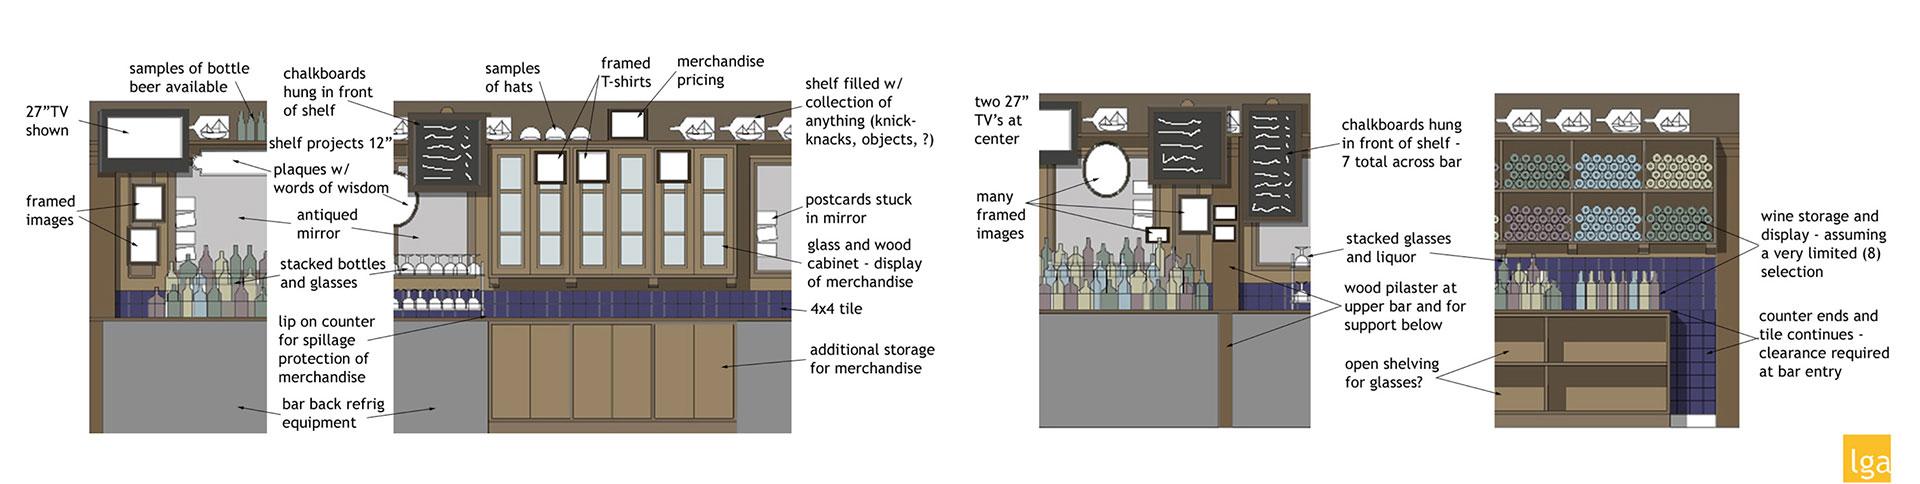 AC - 8-harry's-bar-sketch-2